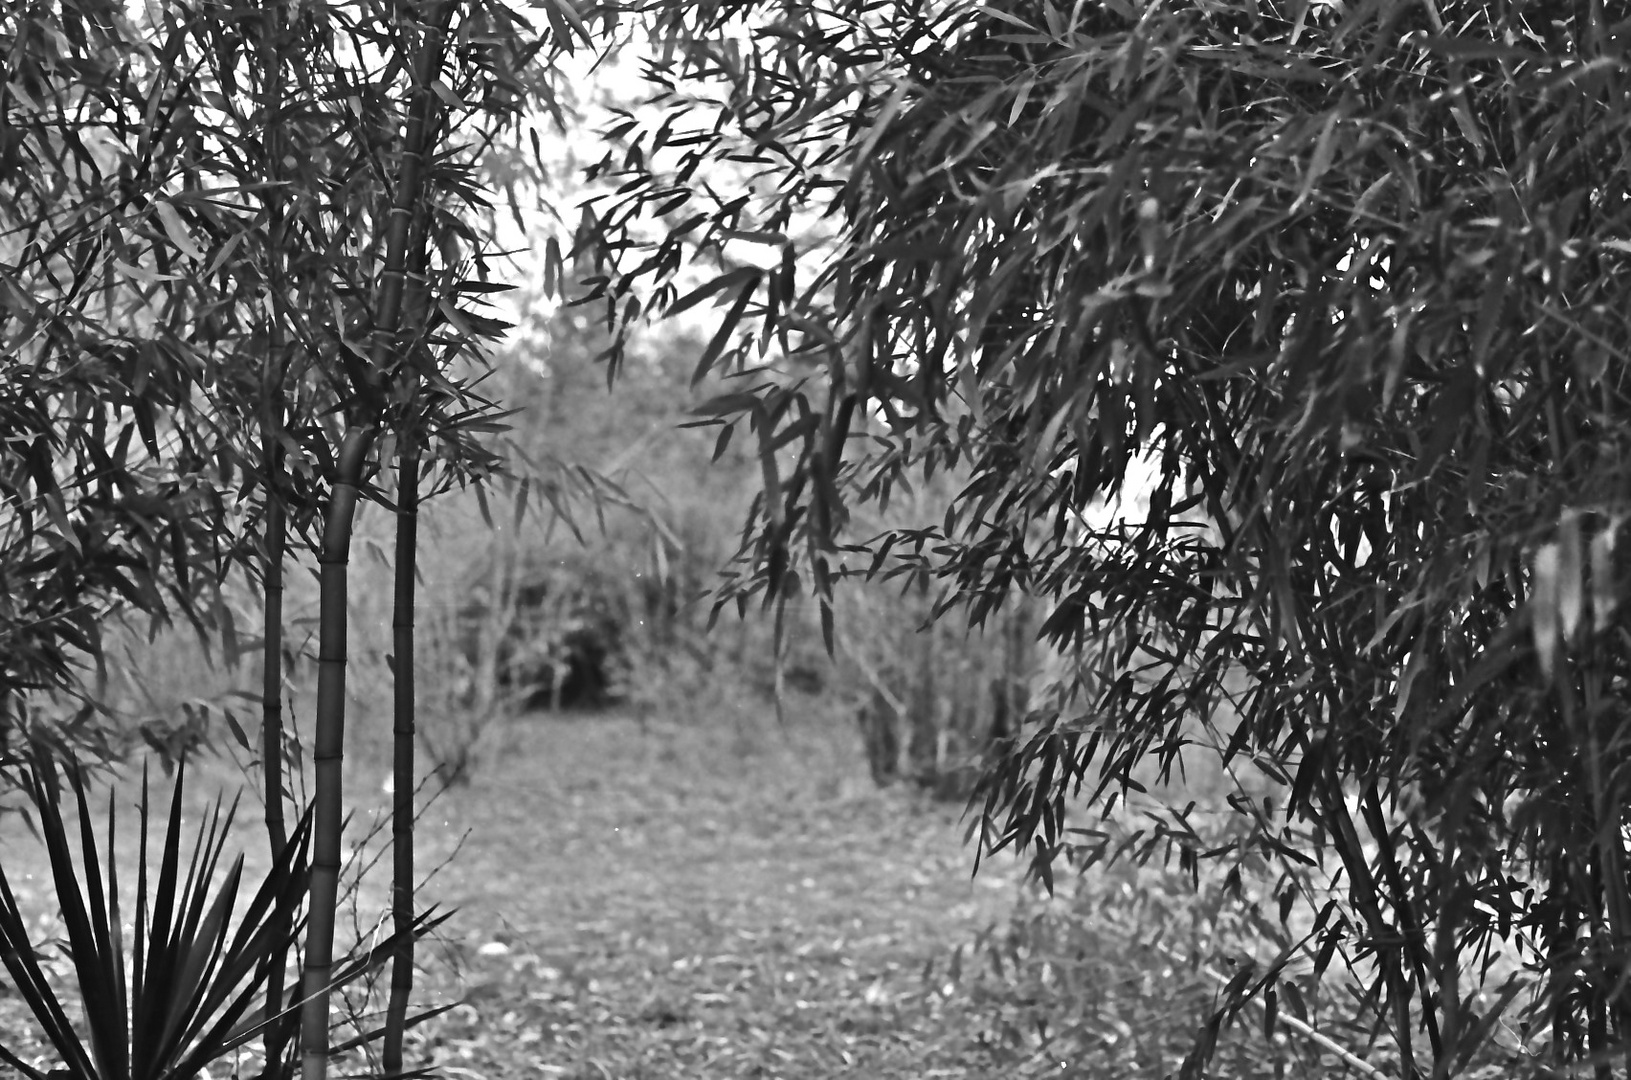 bamboo and yucca